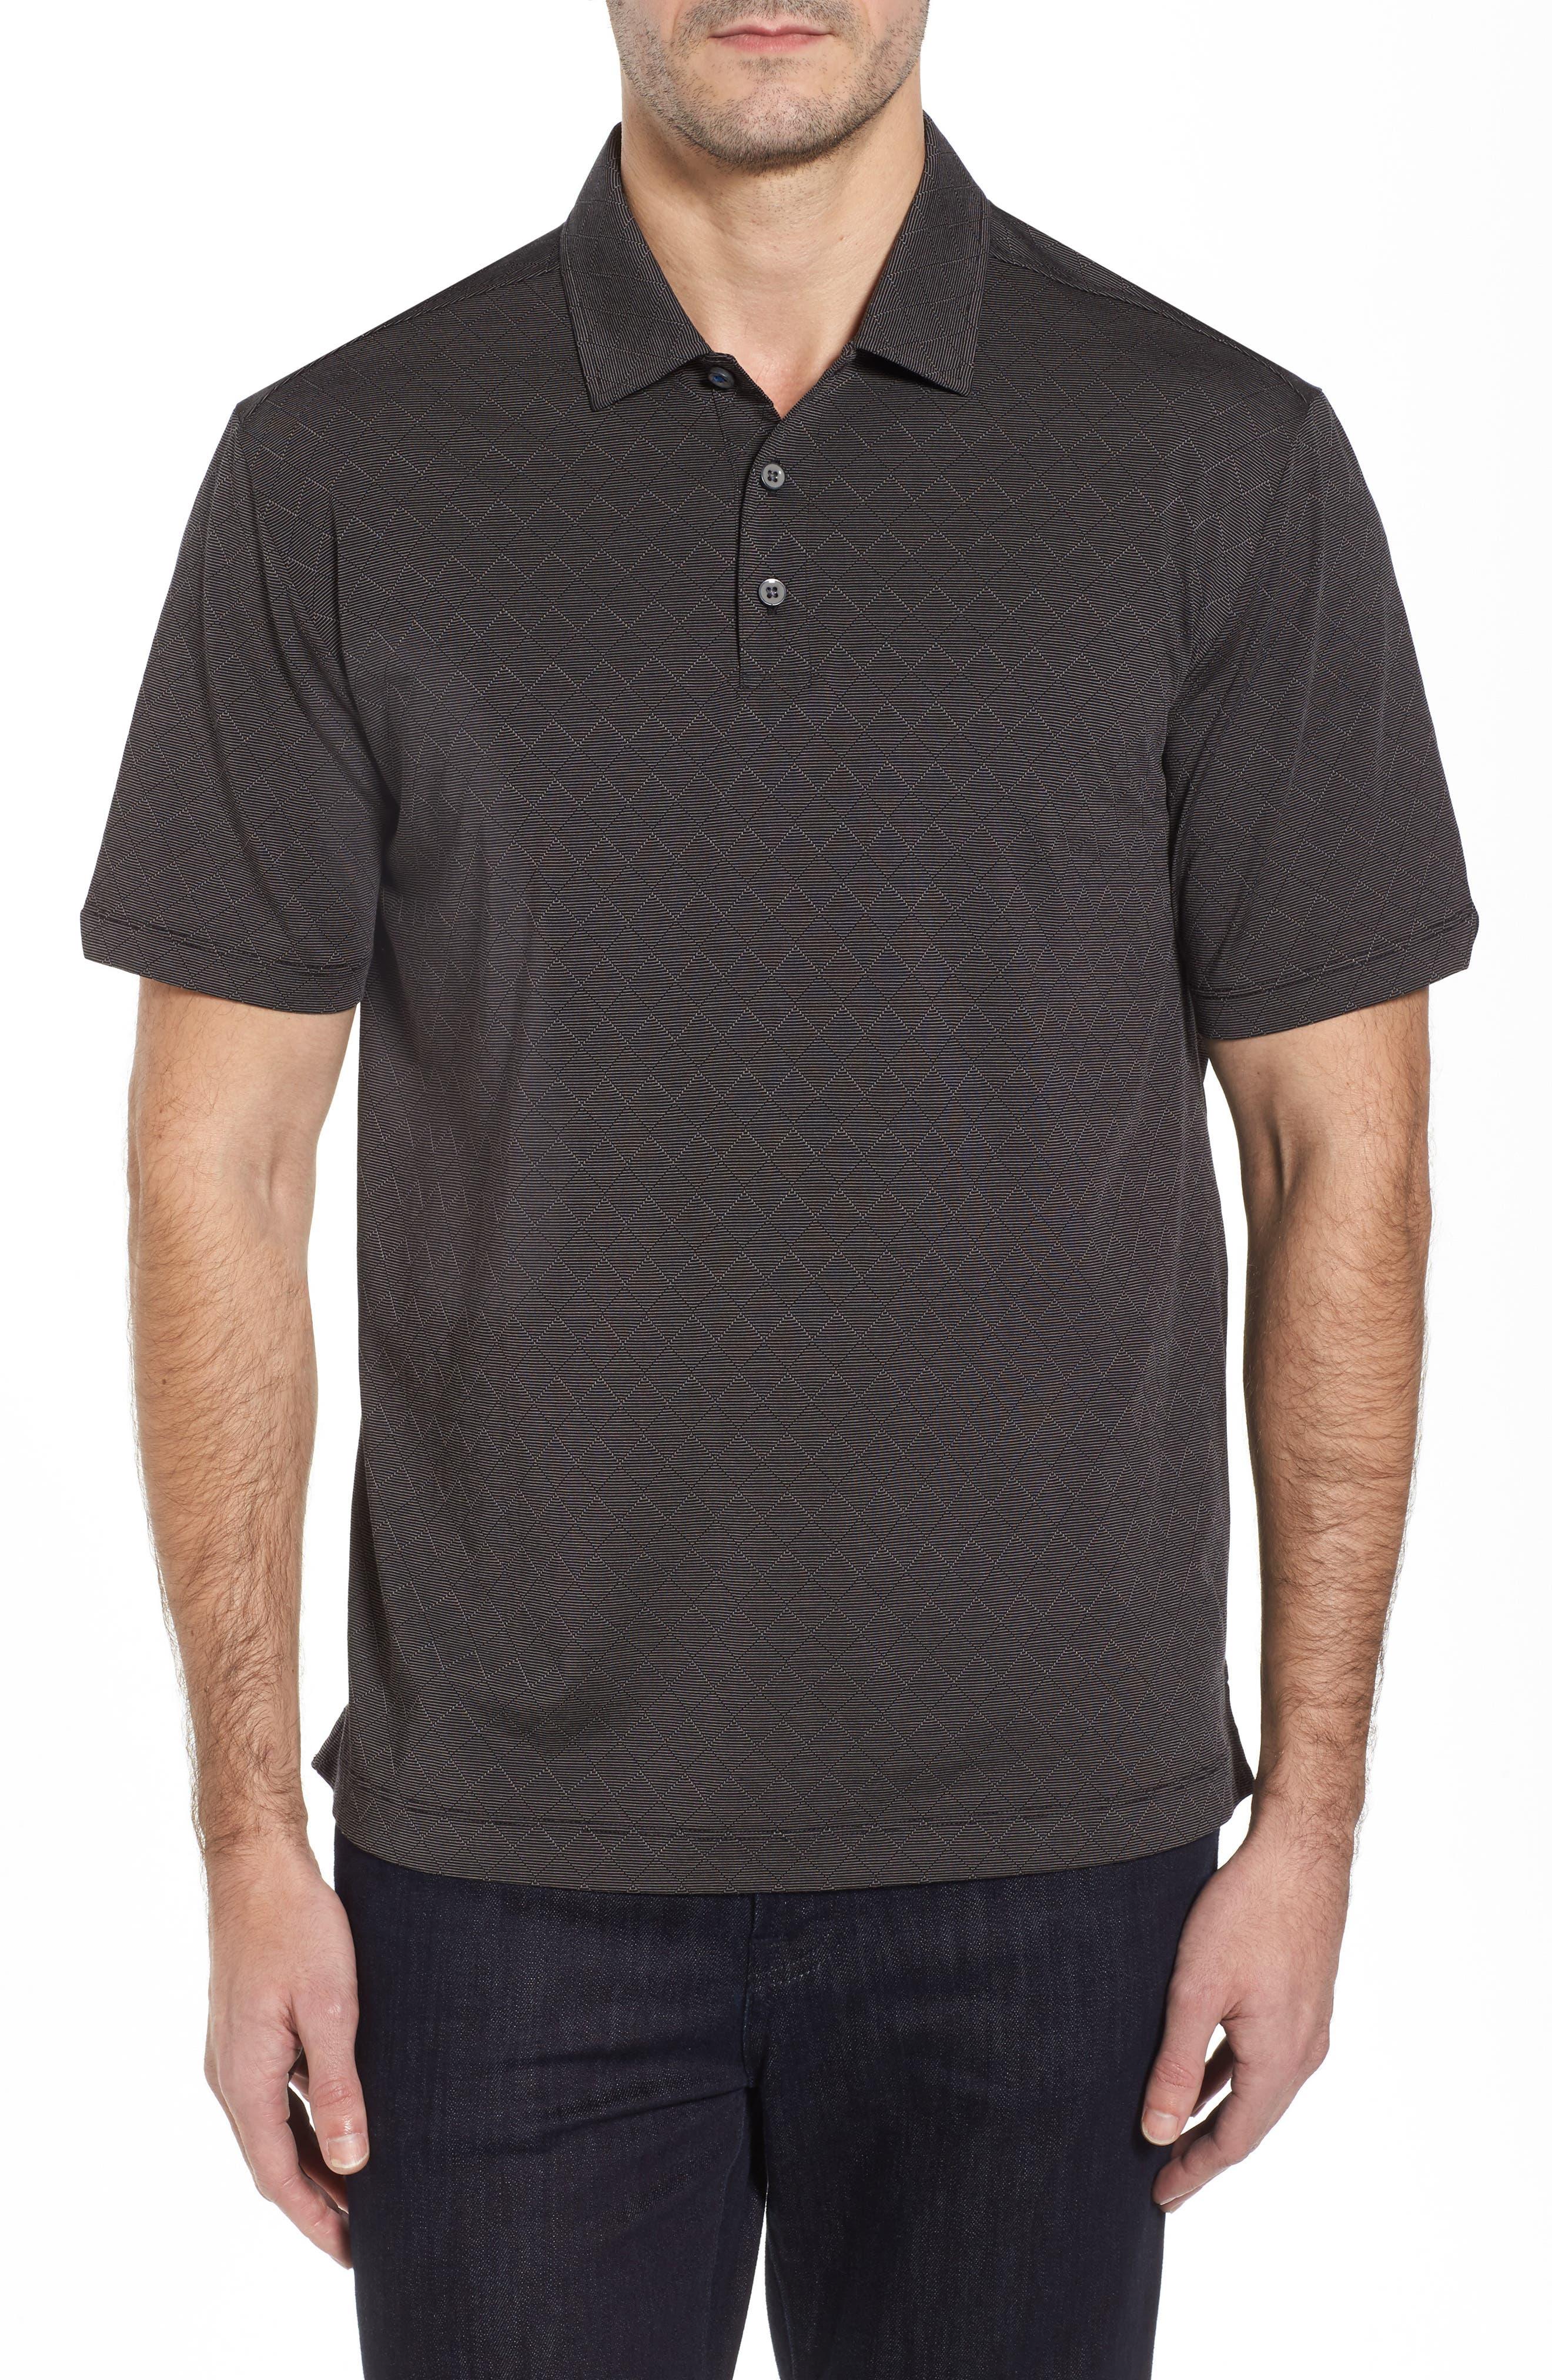 Main Image - Tommy Bahama Diamond Drift Spectator Polo Shirt